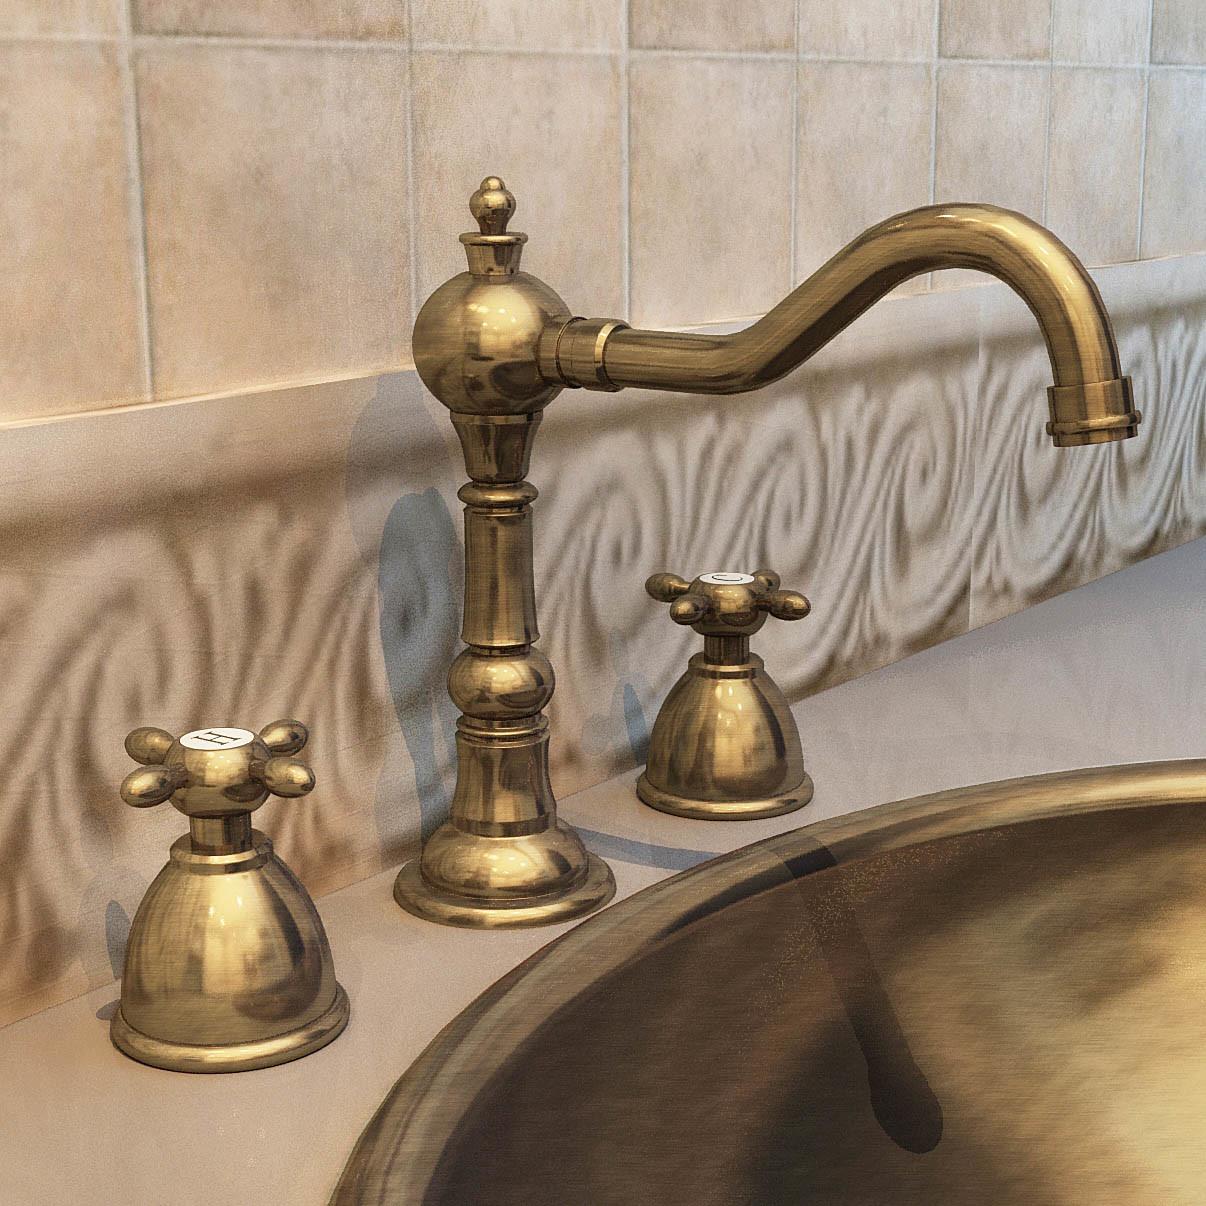 China Faucet Antique Gold Plated Faucet Double Handle Faucet Wr 502406 Photos Pictures